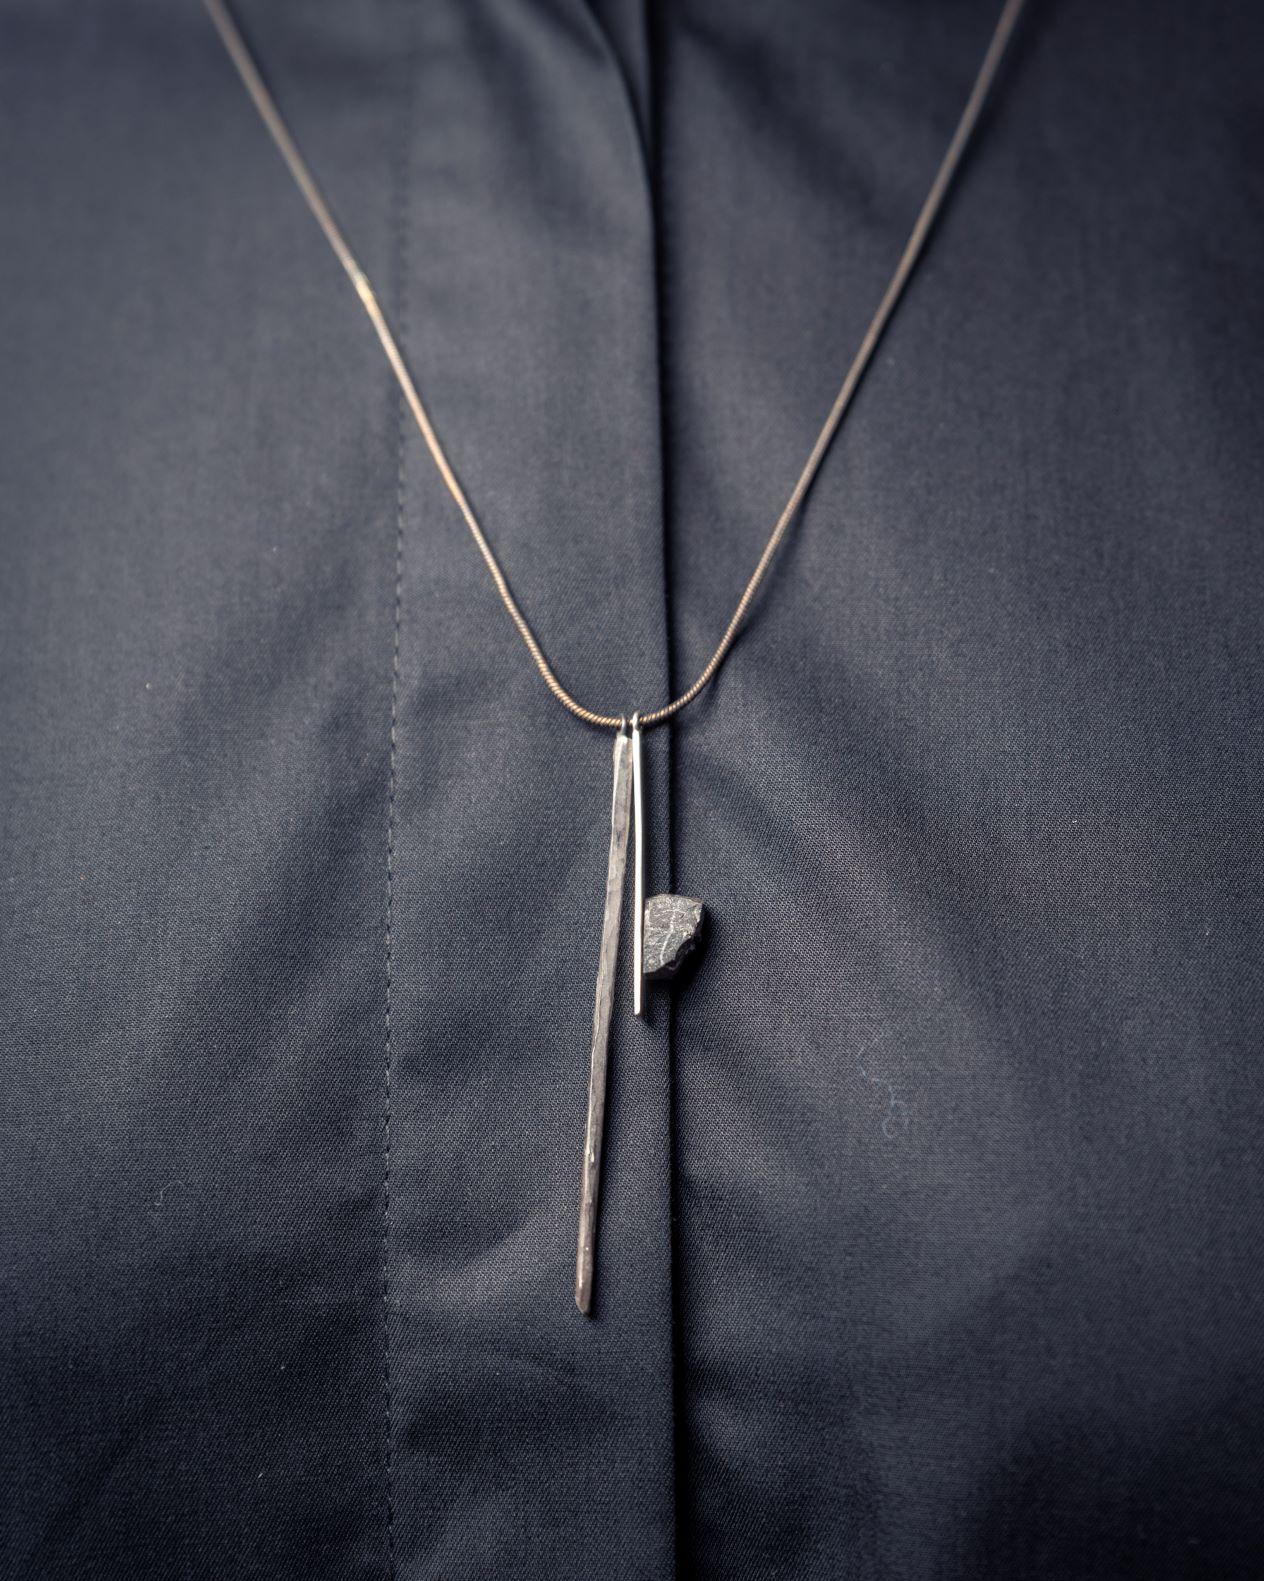 Silver pendant by June9Concept